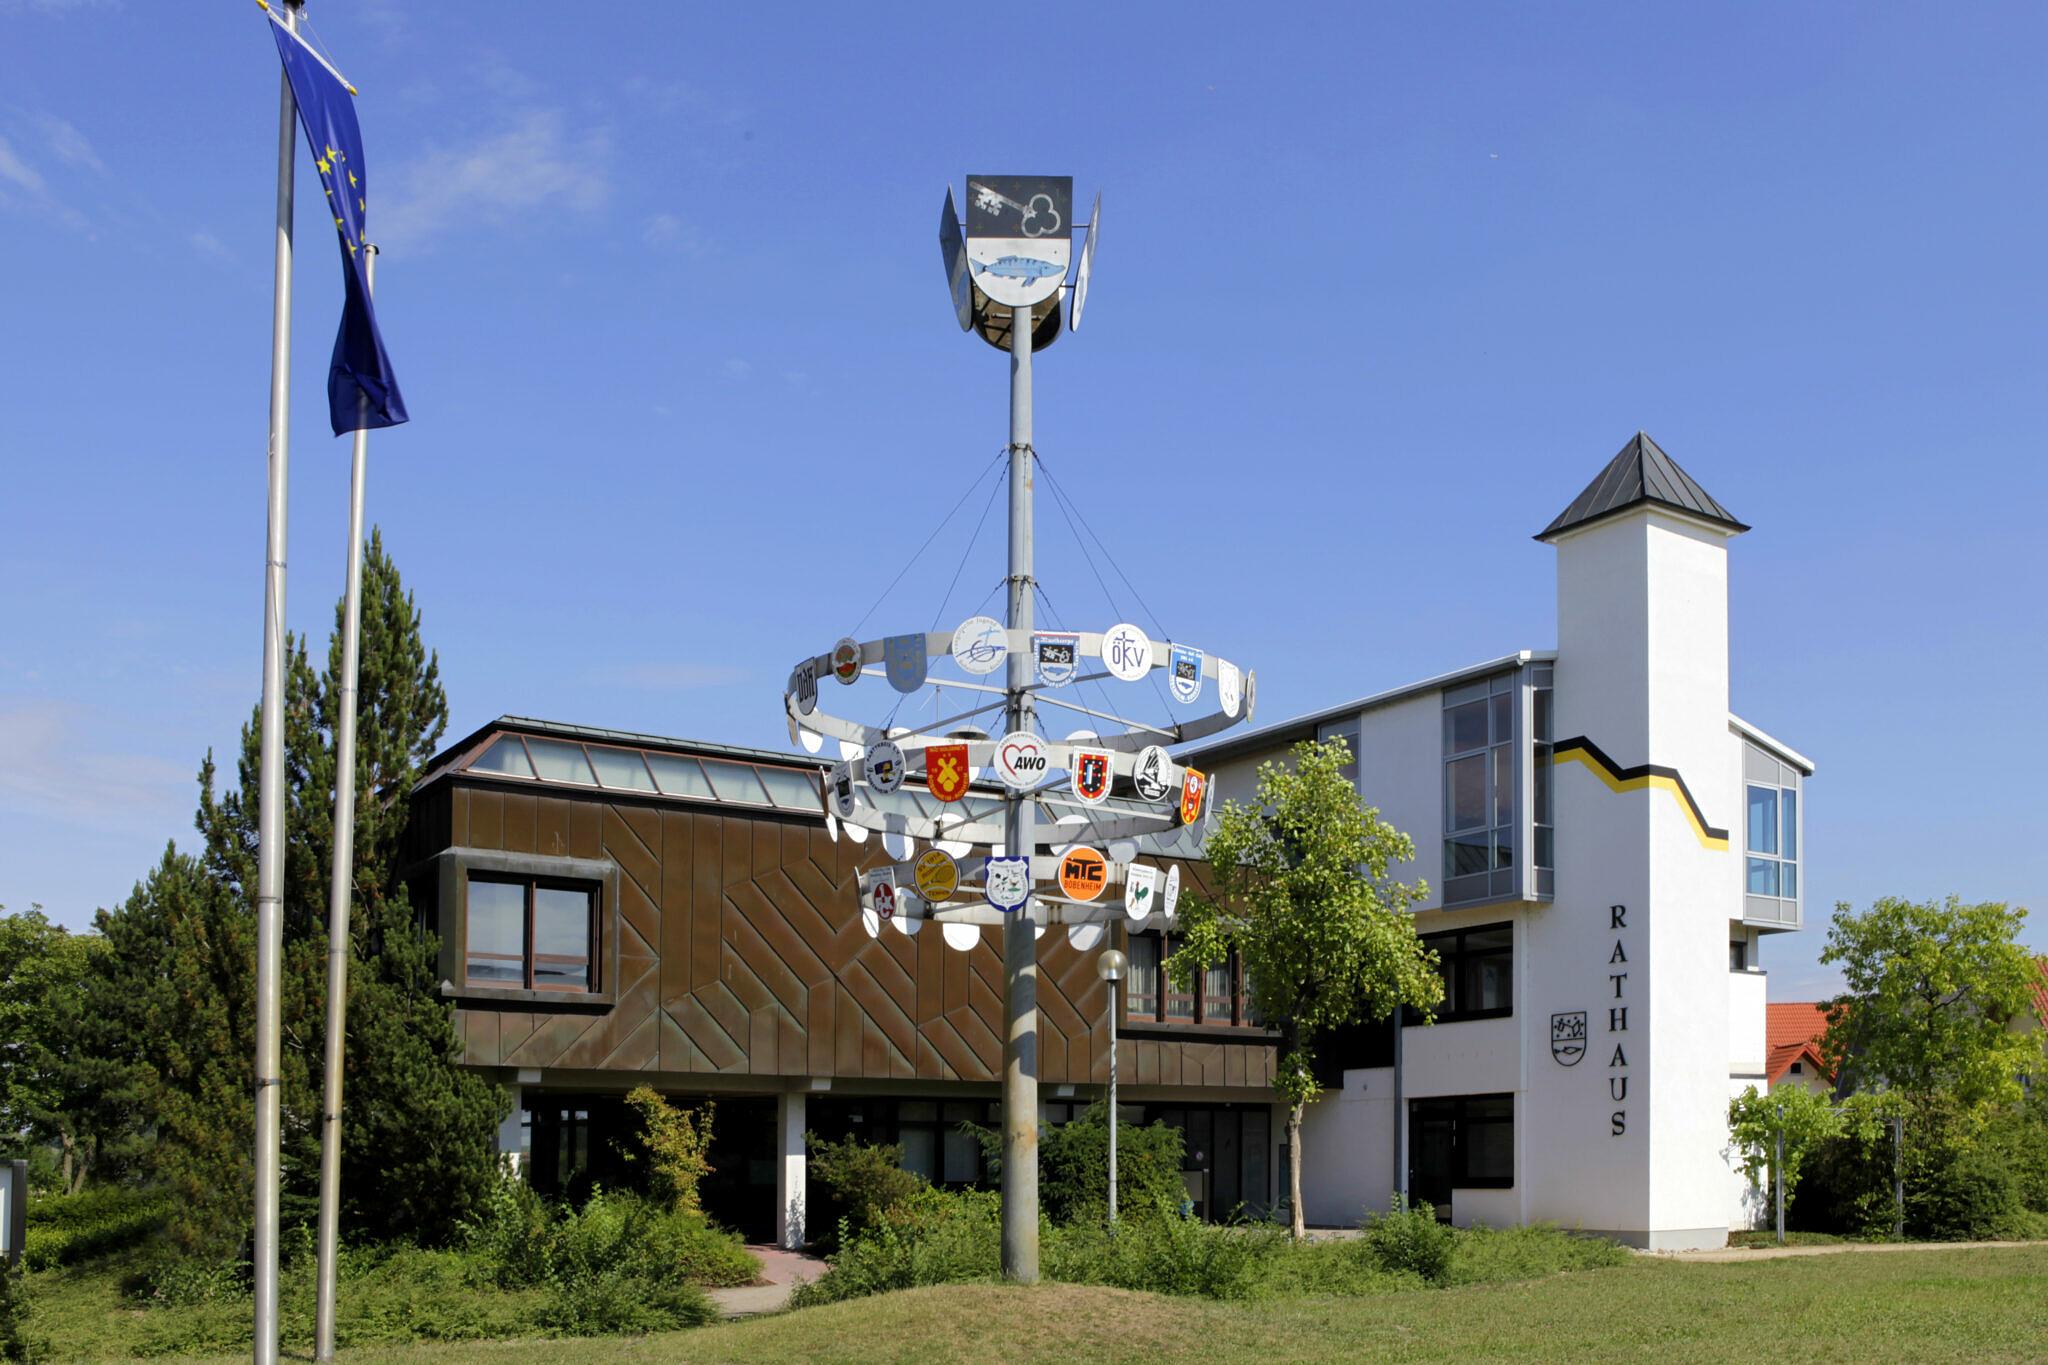 Borough of Bobenheim-Roxheim - Small local government, big digitization project